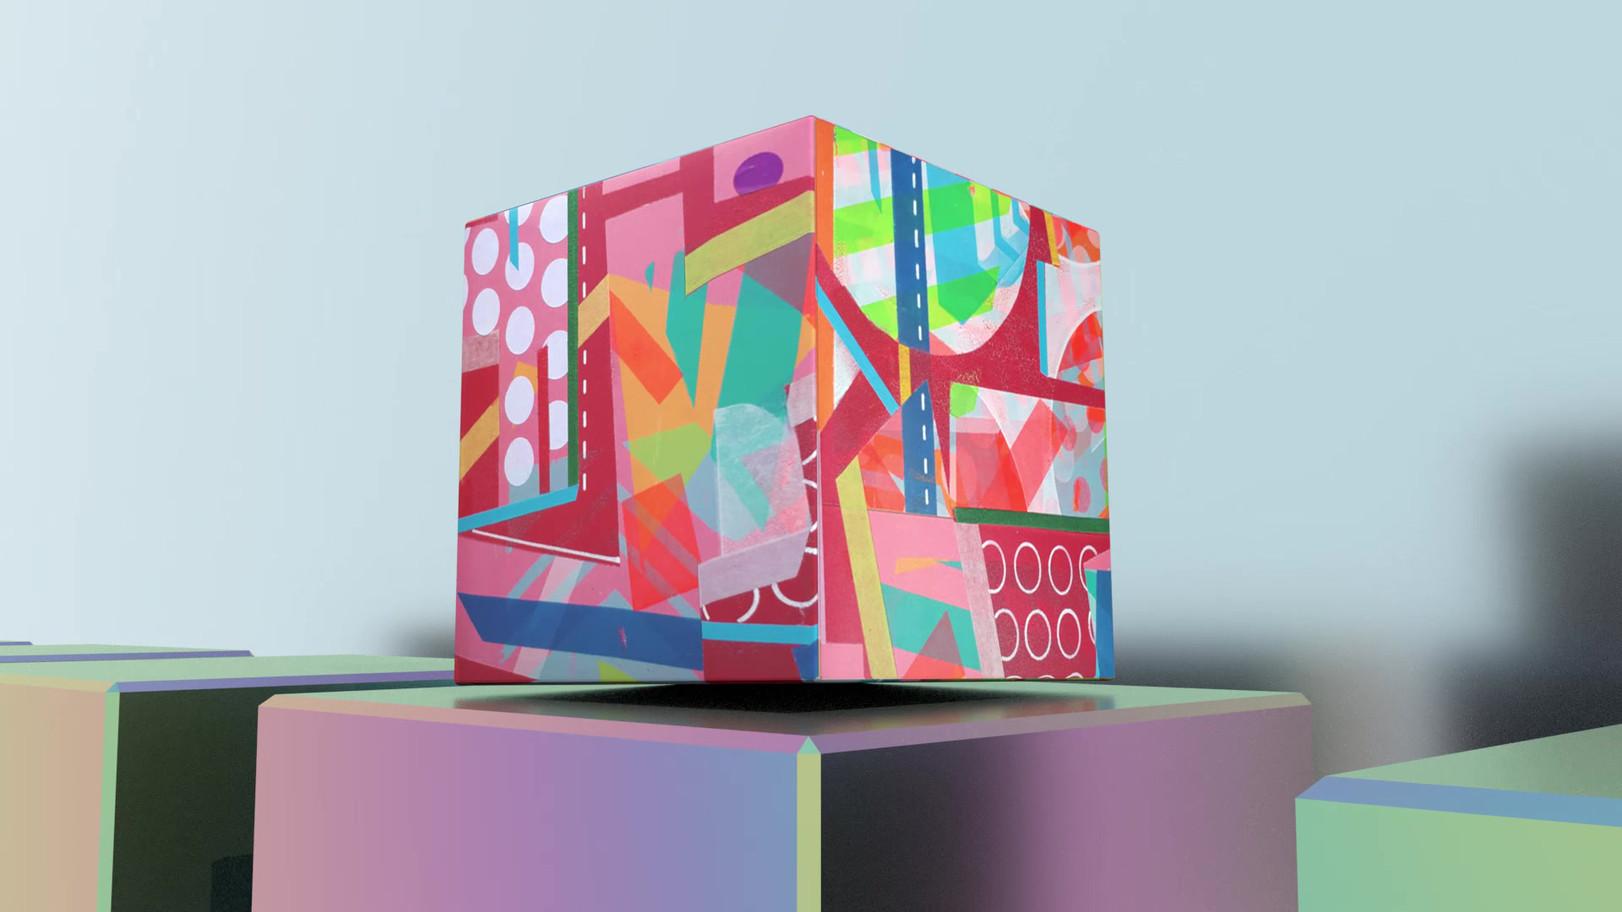 Cubes_factory.mp4